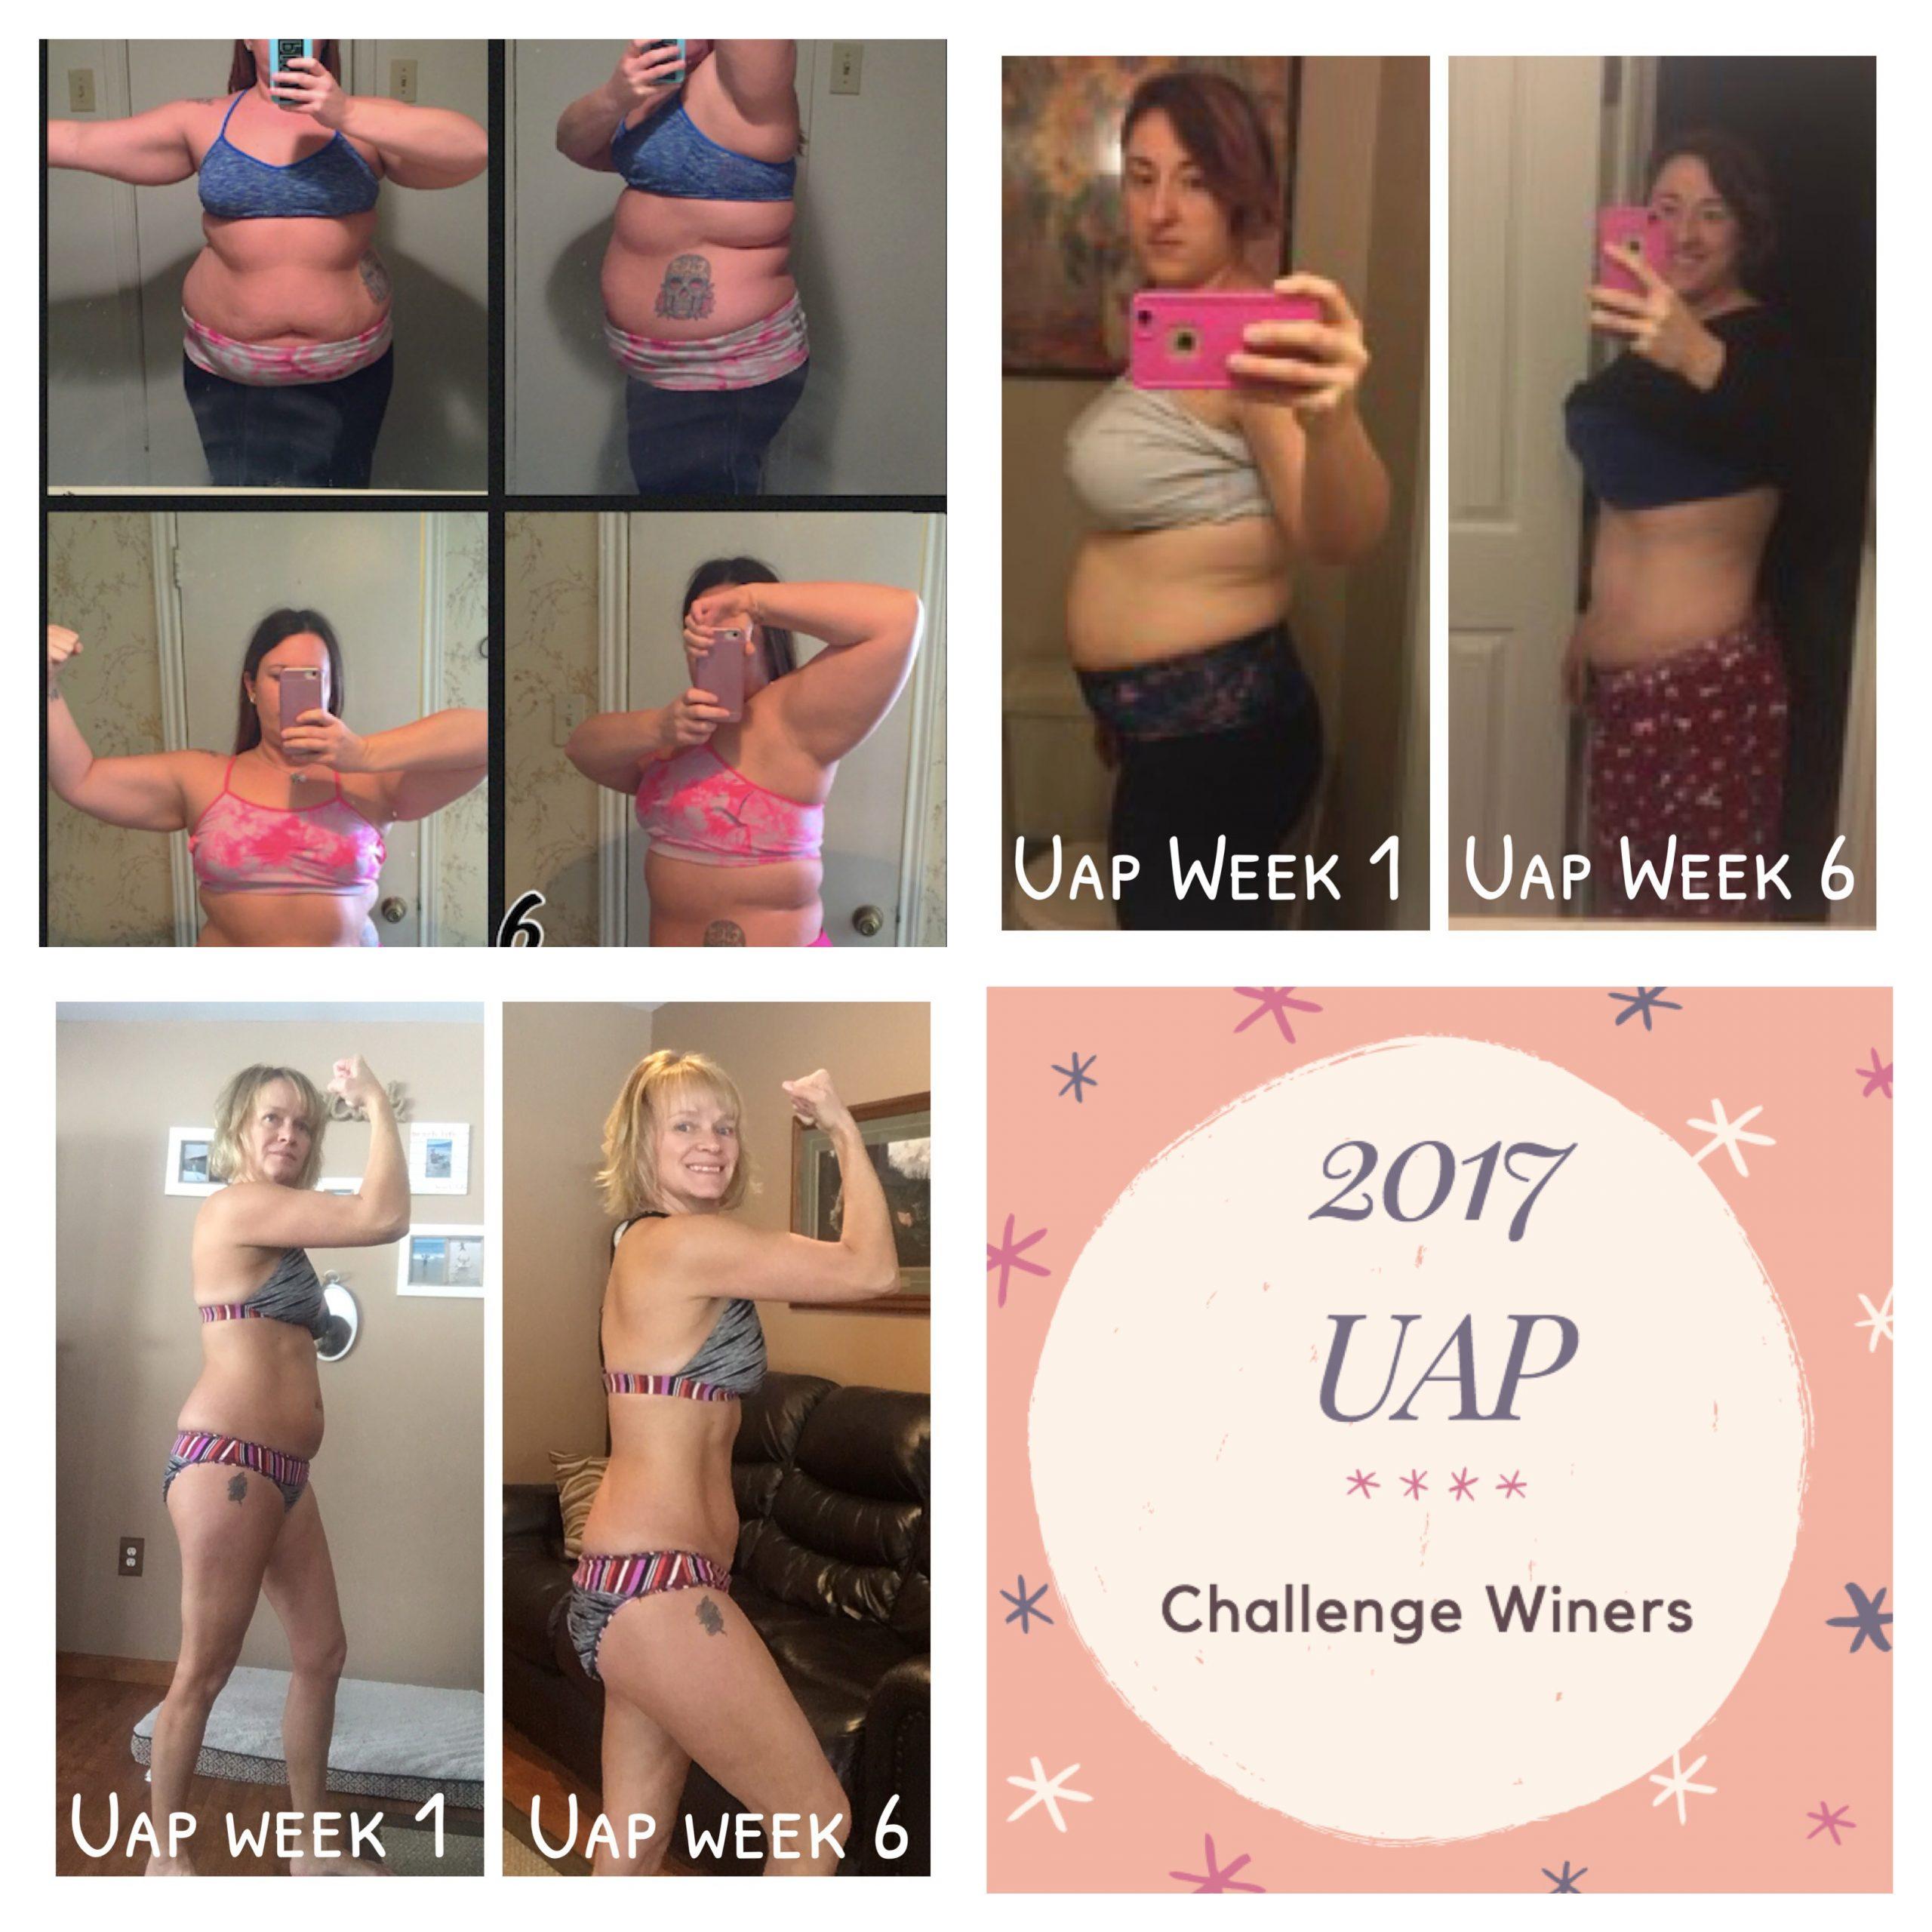 2017 UAP Challenge Winners